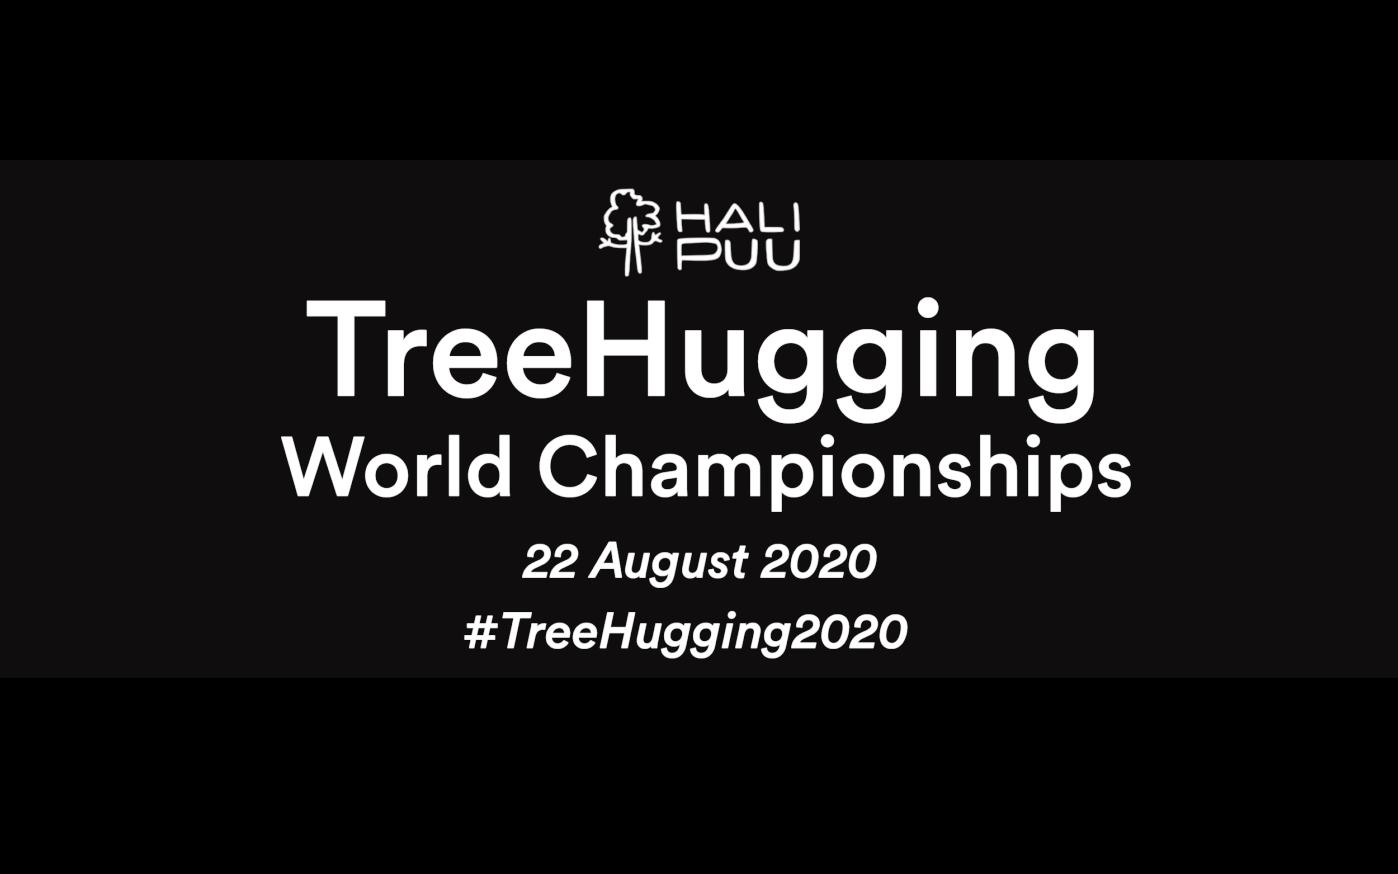 TreeHugging World Championships 2020